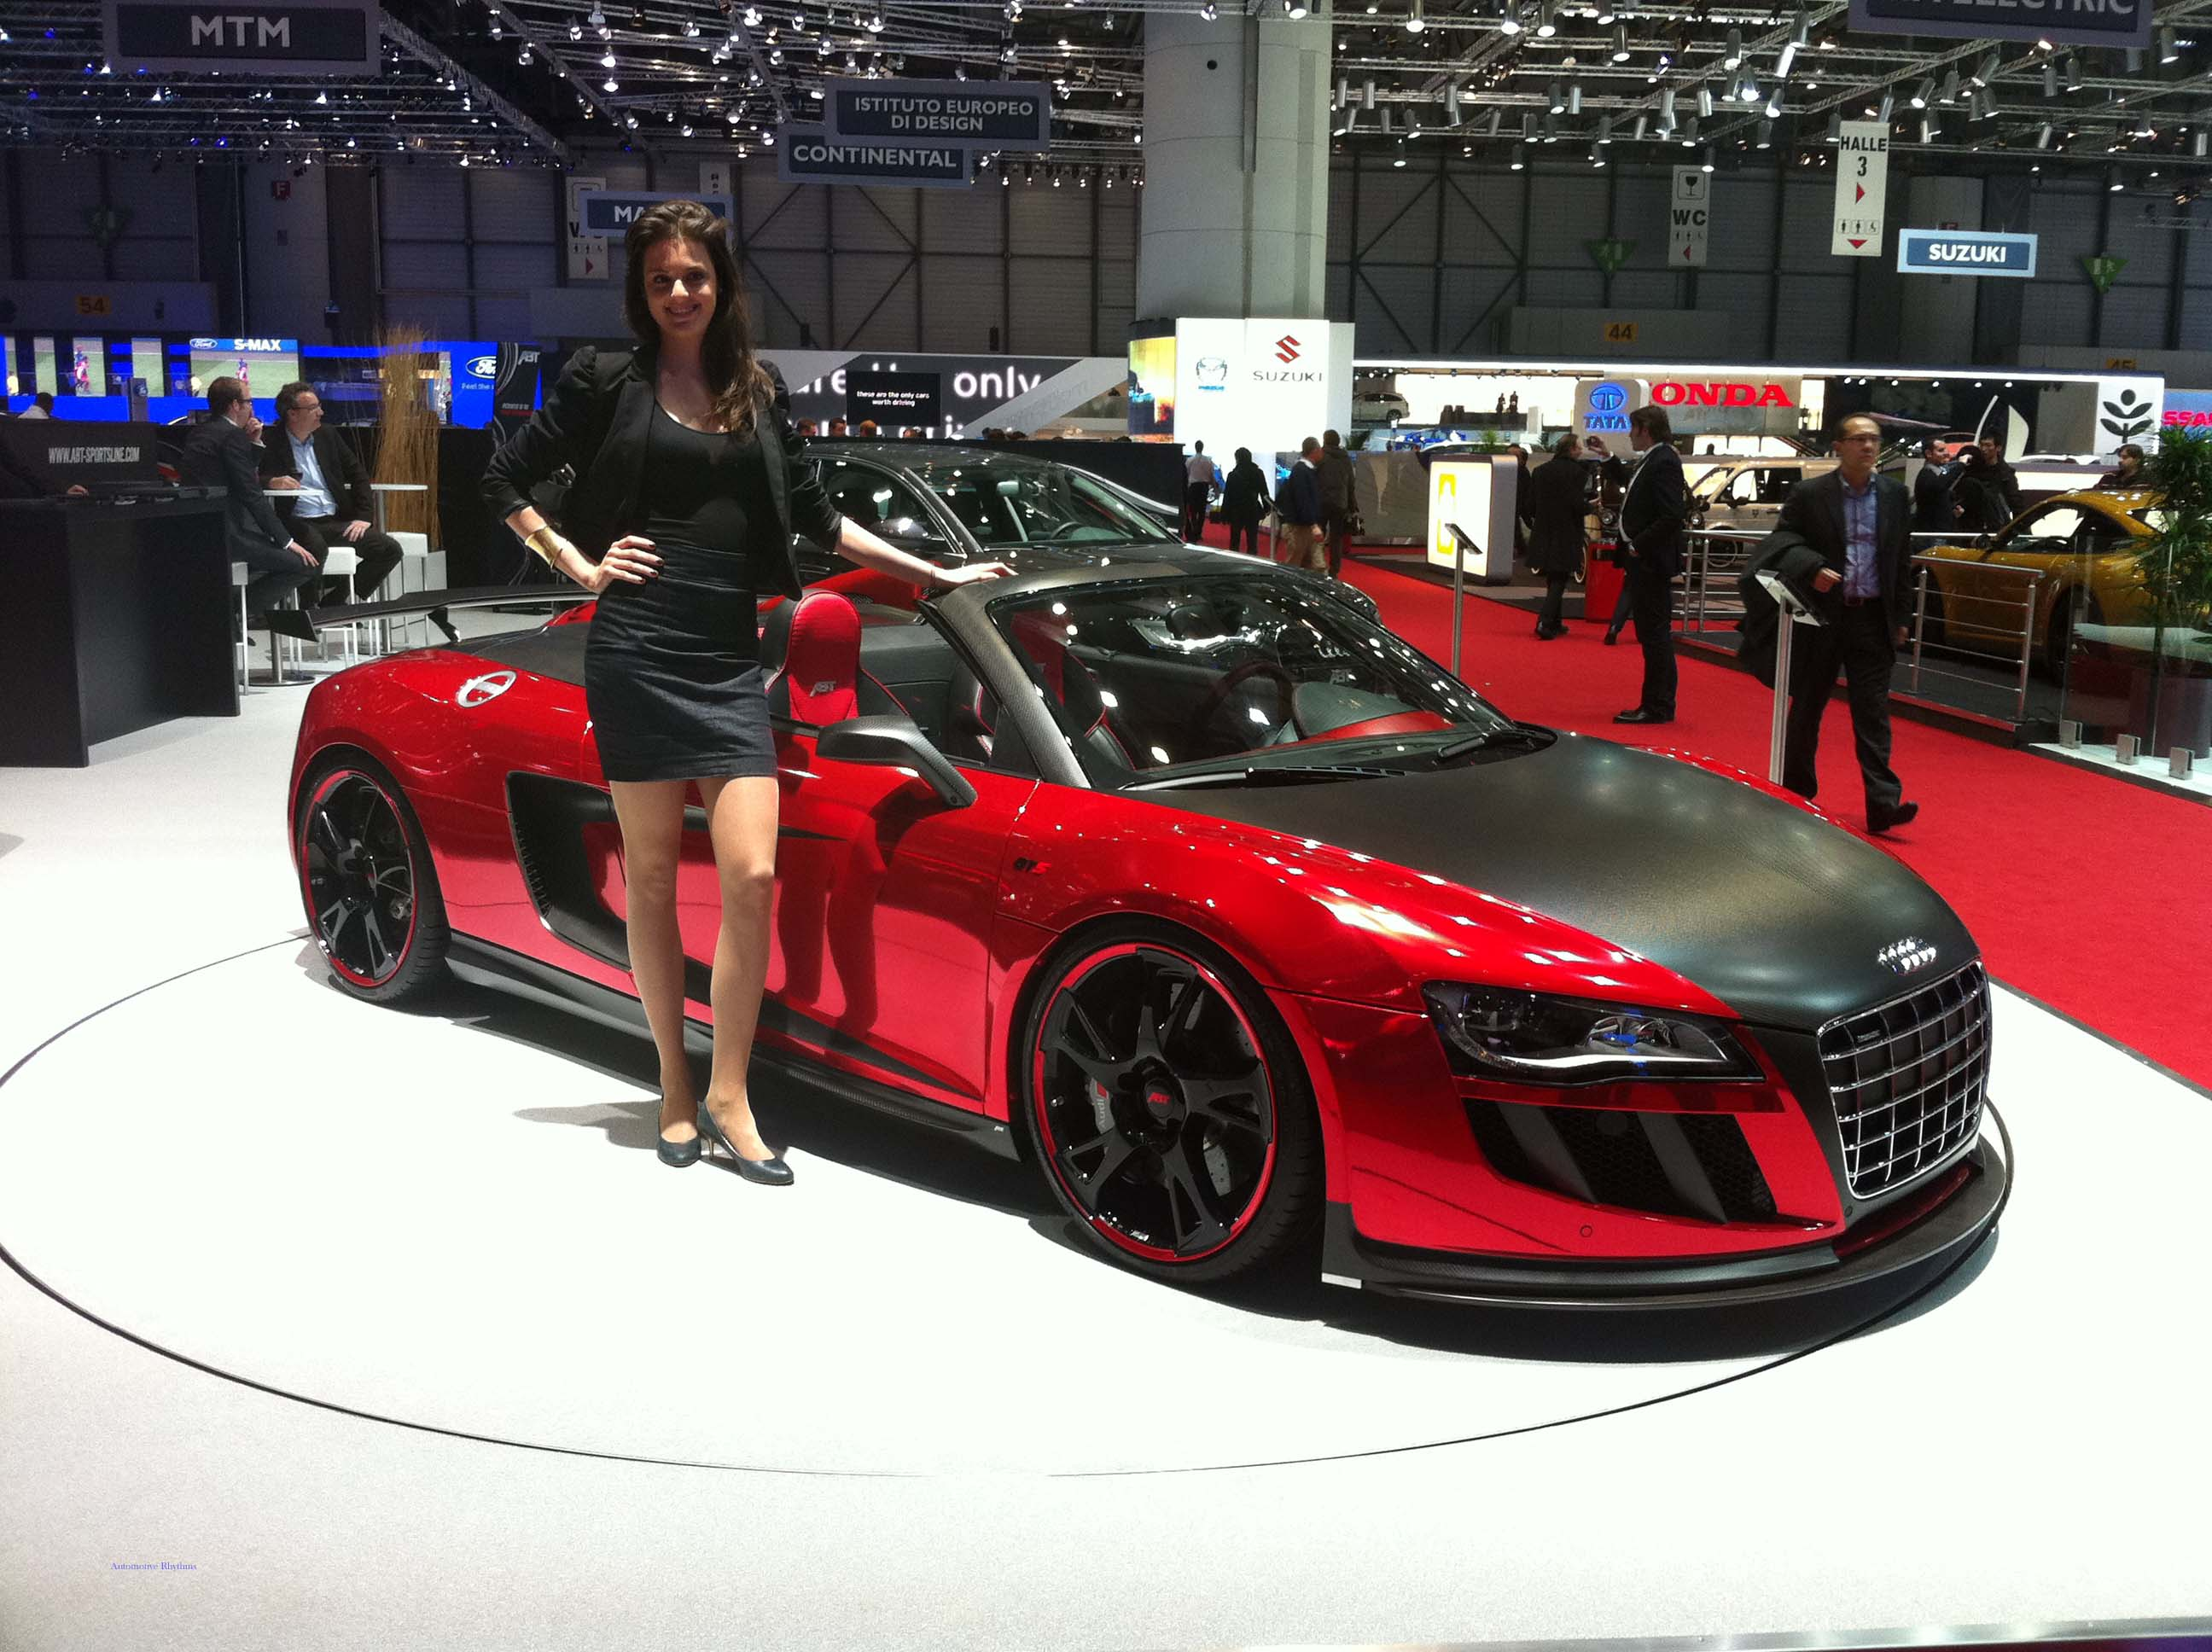 Geneva Motor Show - Custom Audi R8 Spyder